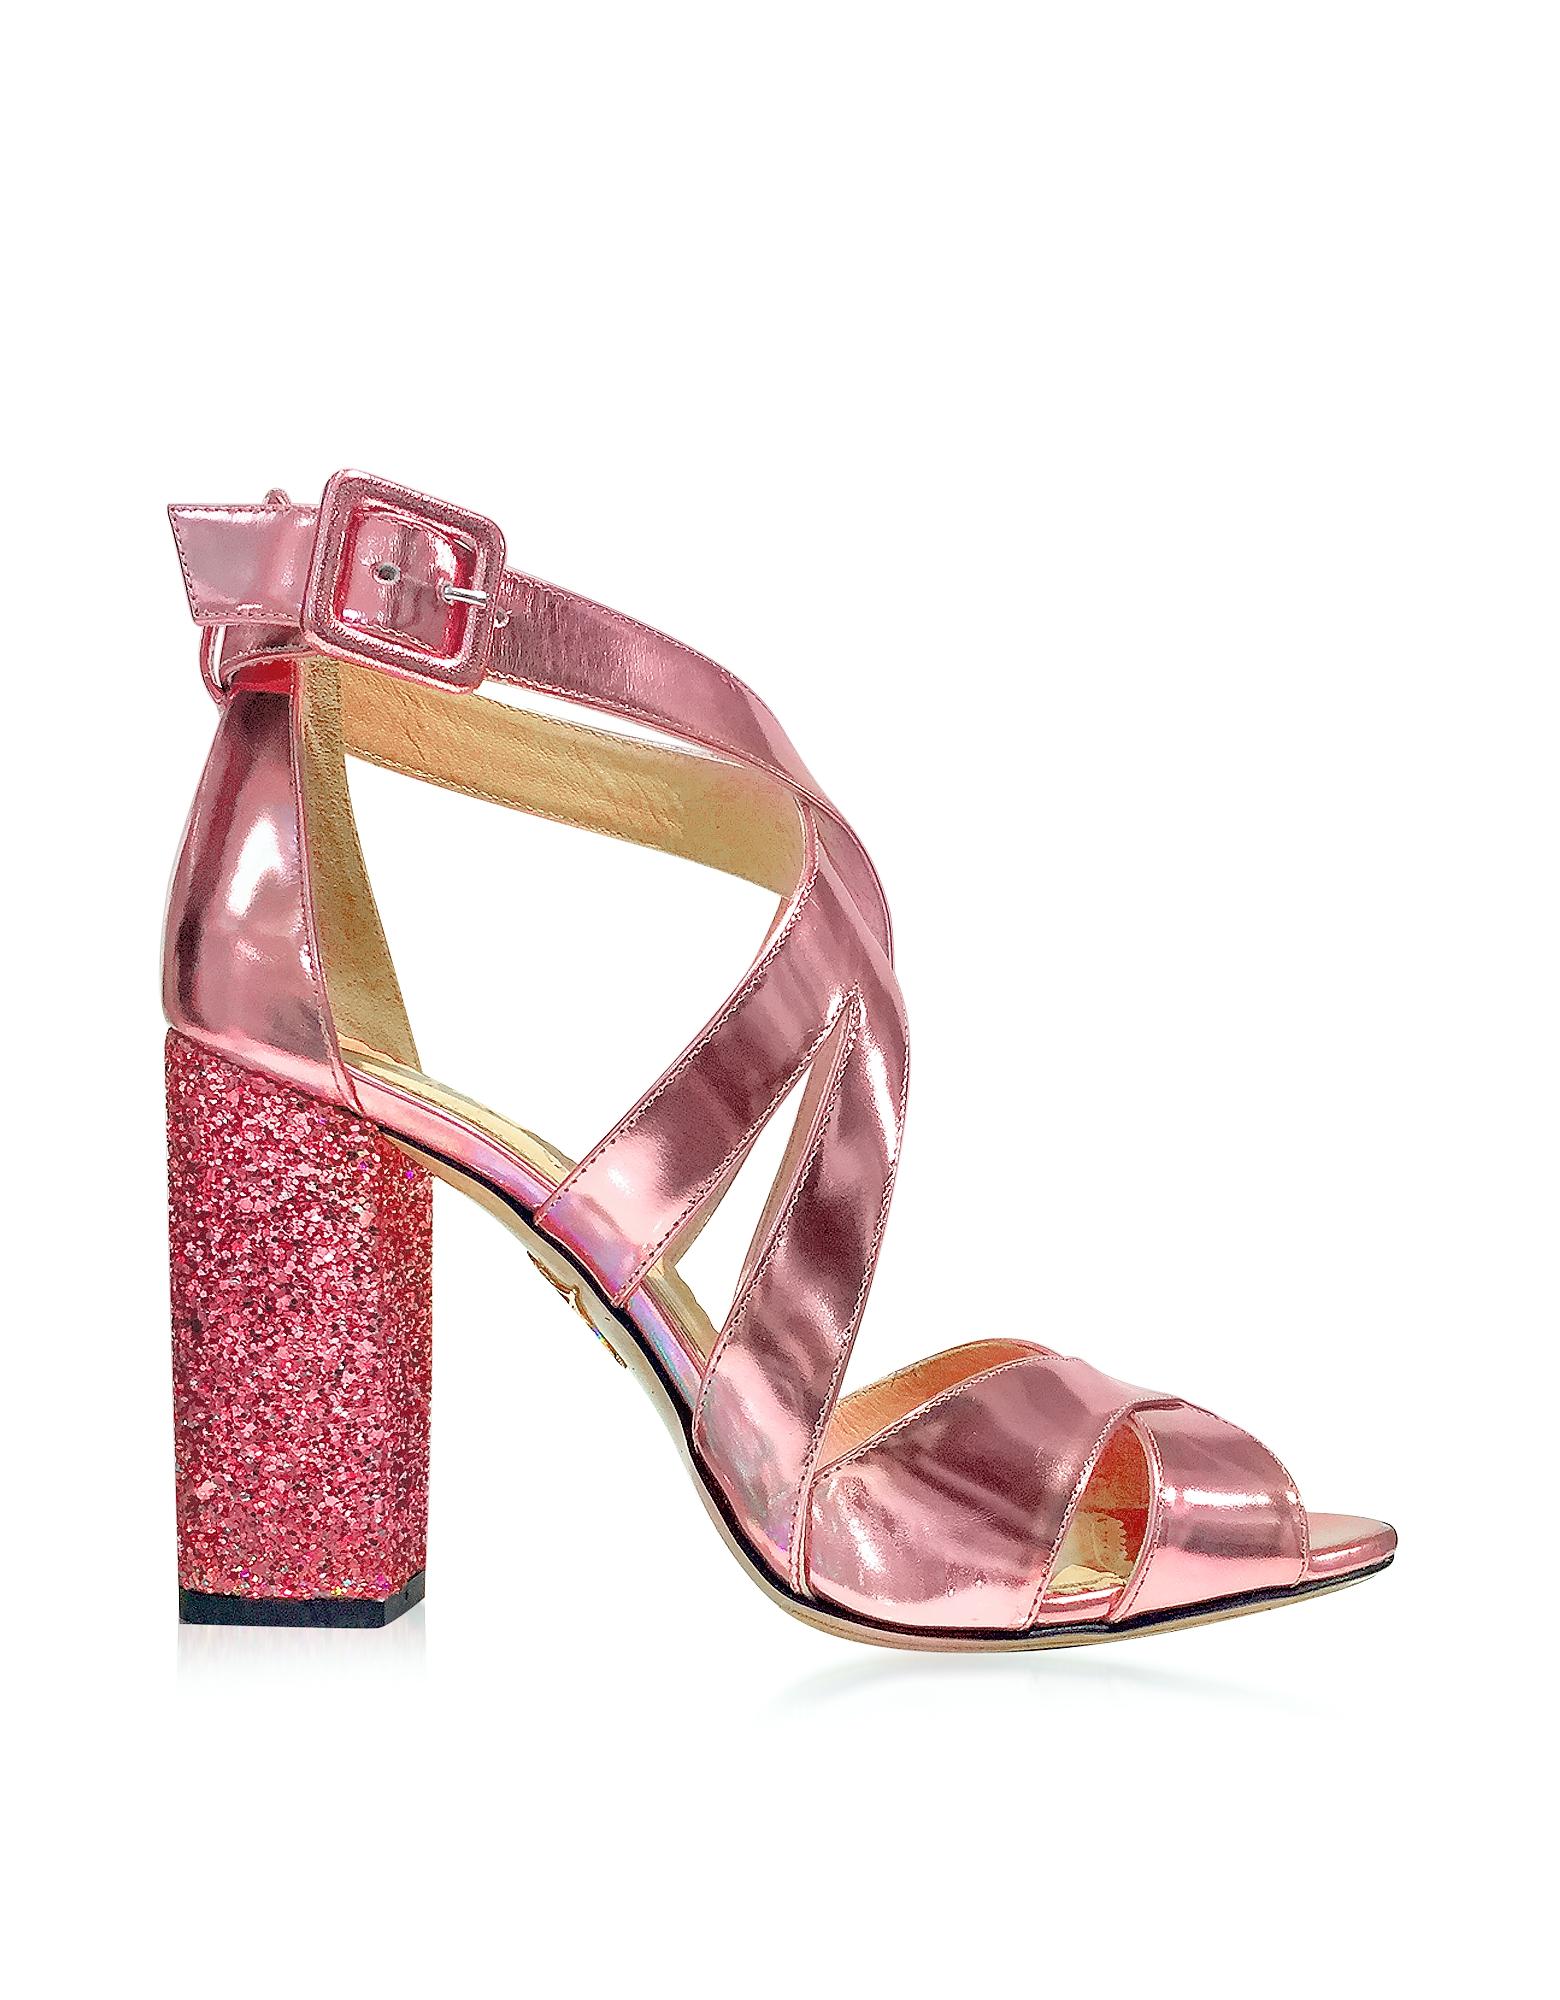 Apollo - Сандалии из Кожи Металлик Оттенка Розовый Кварц с Блестками